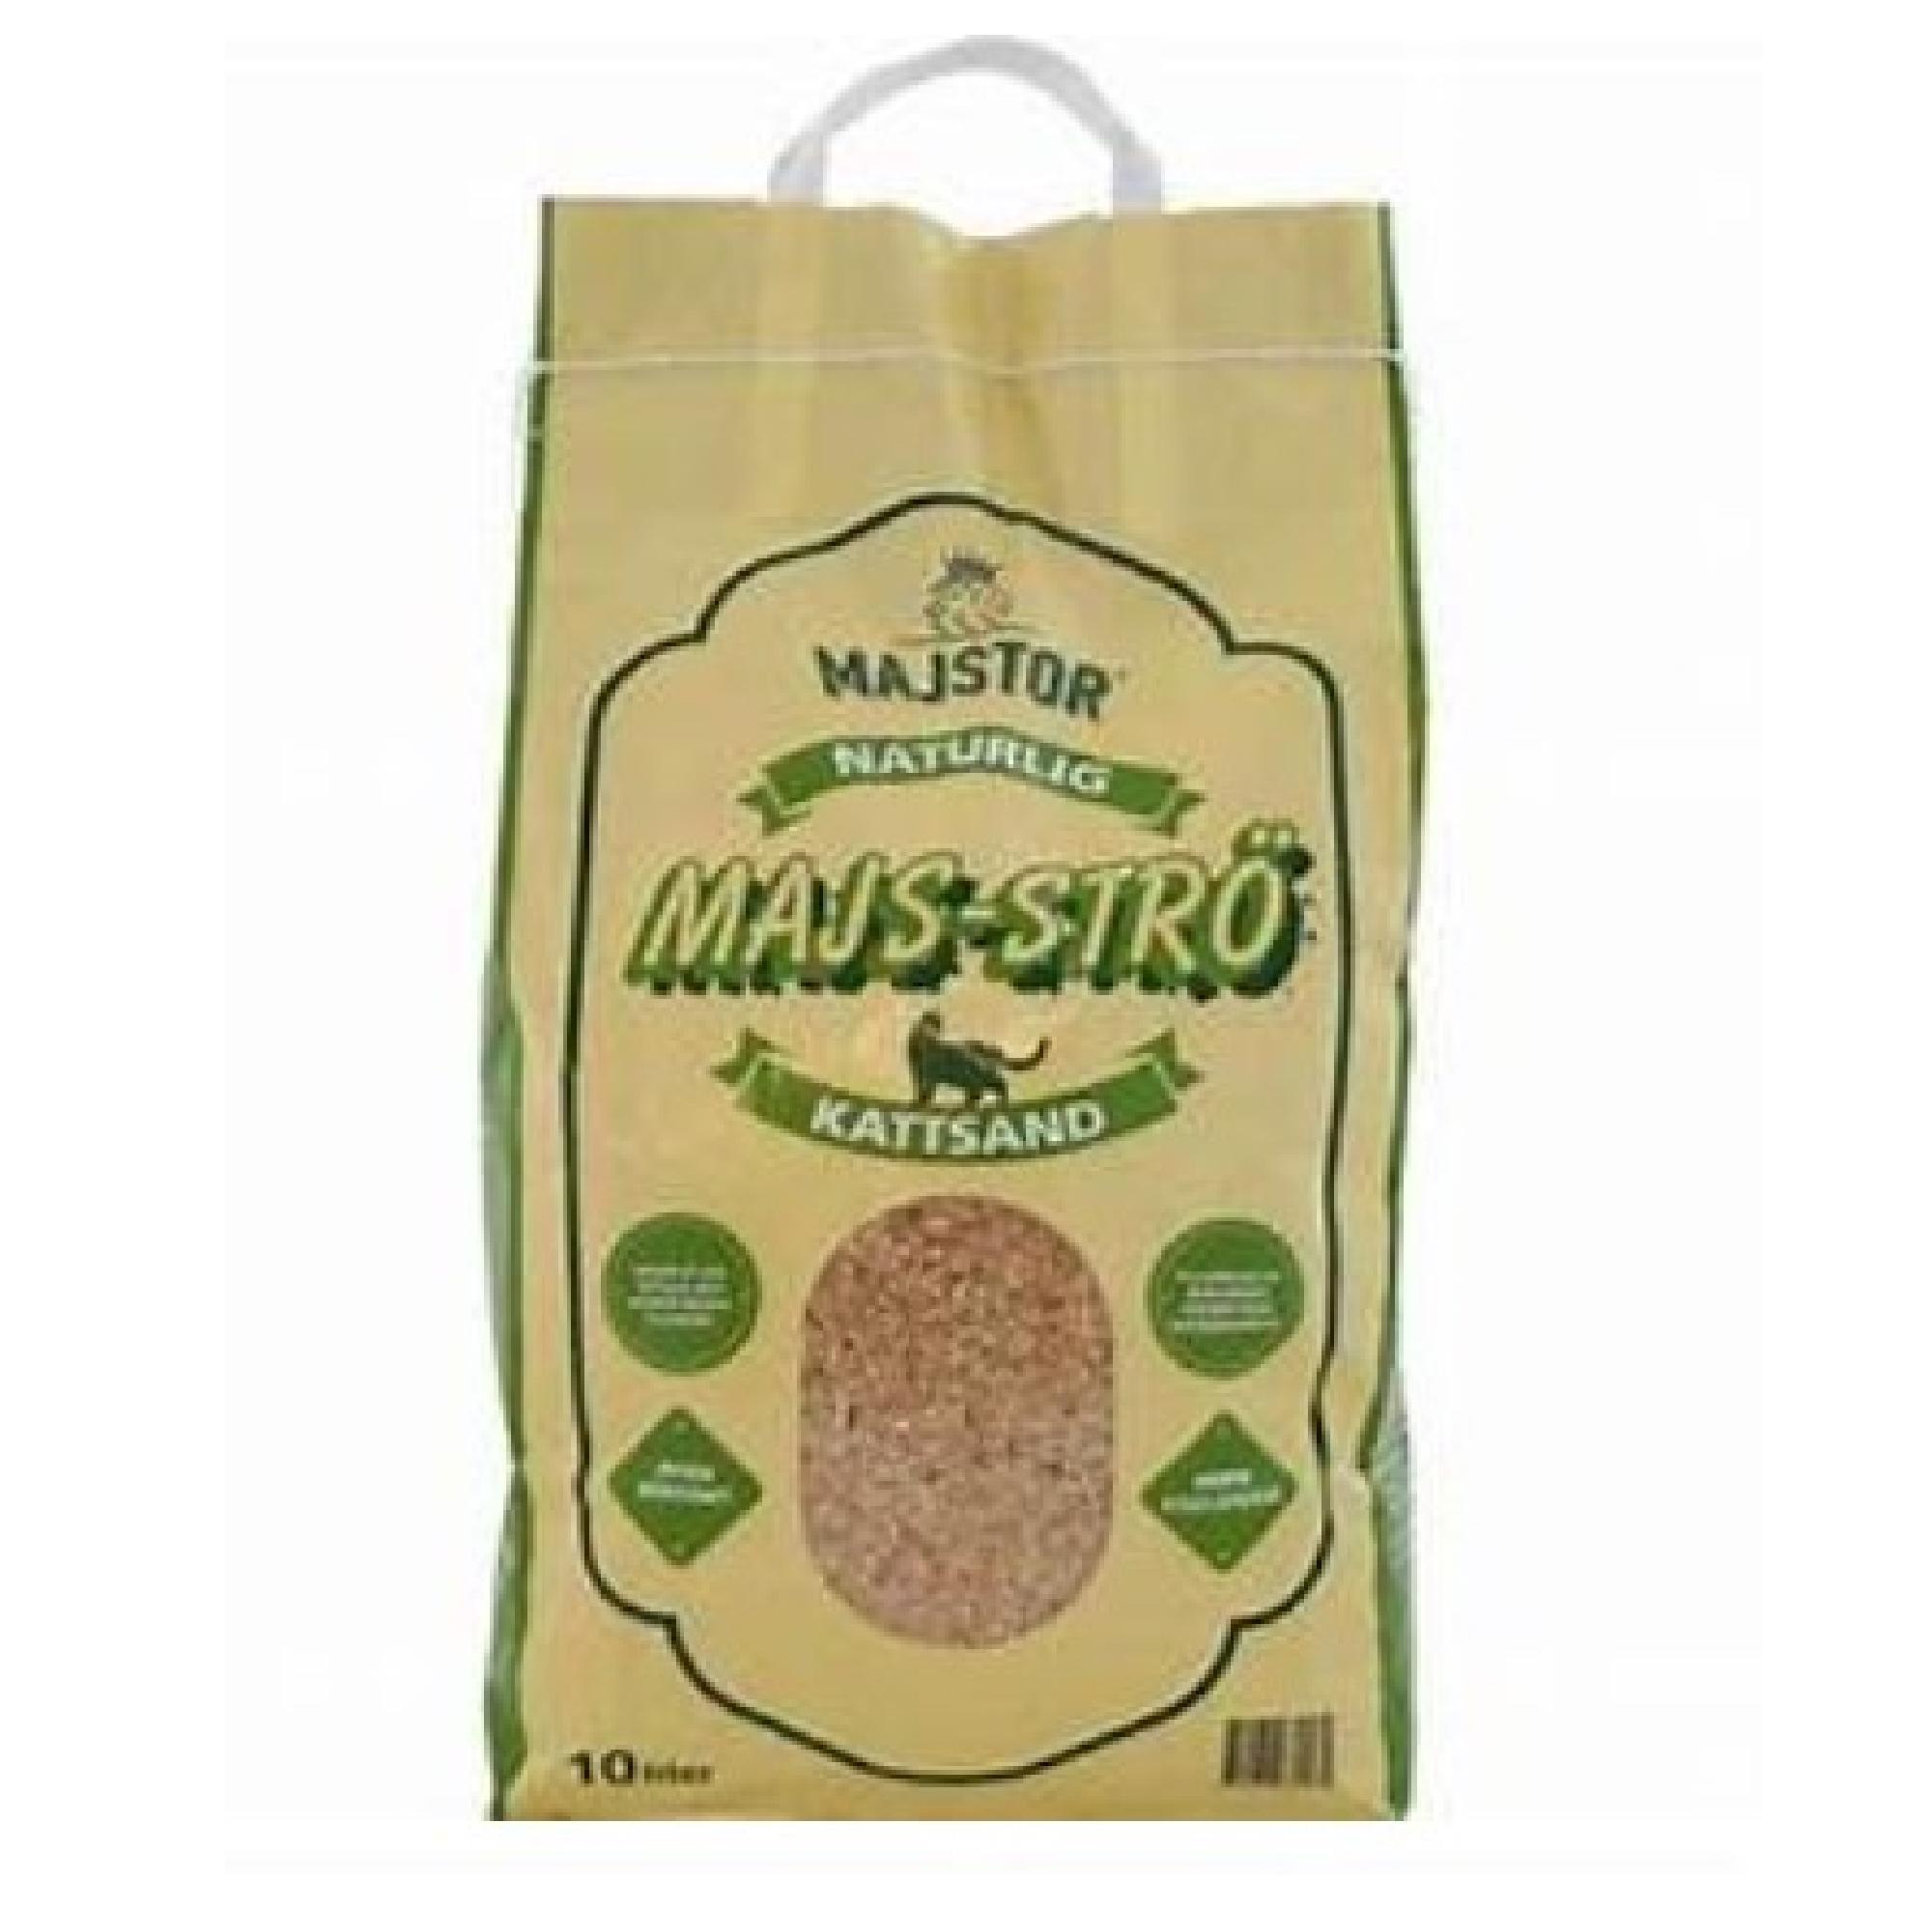 Majstor Majs-Strö Kattsand 10 liter